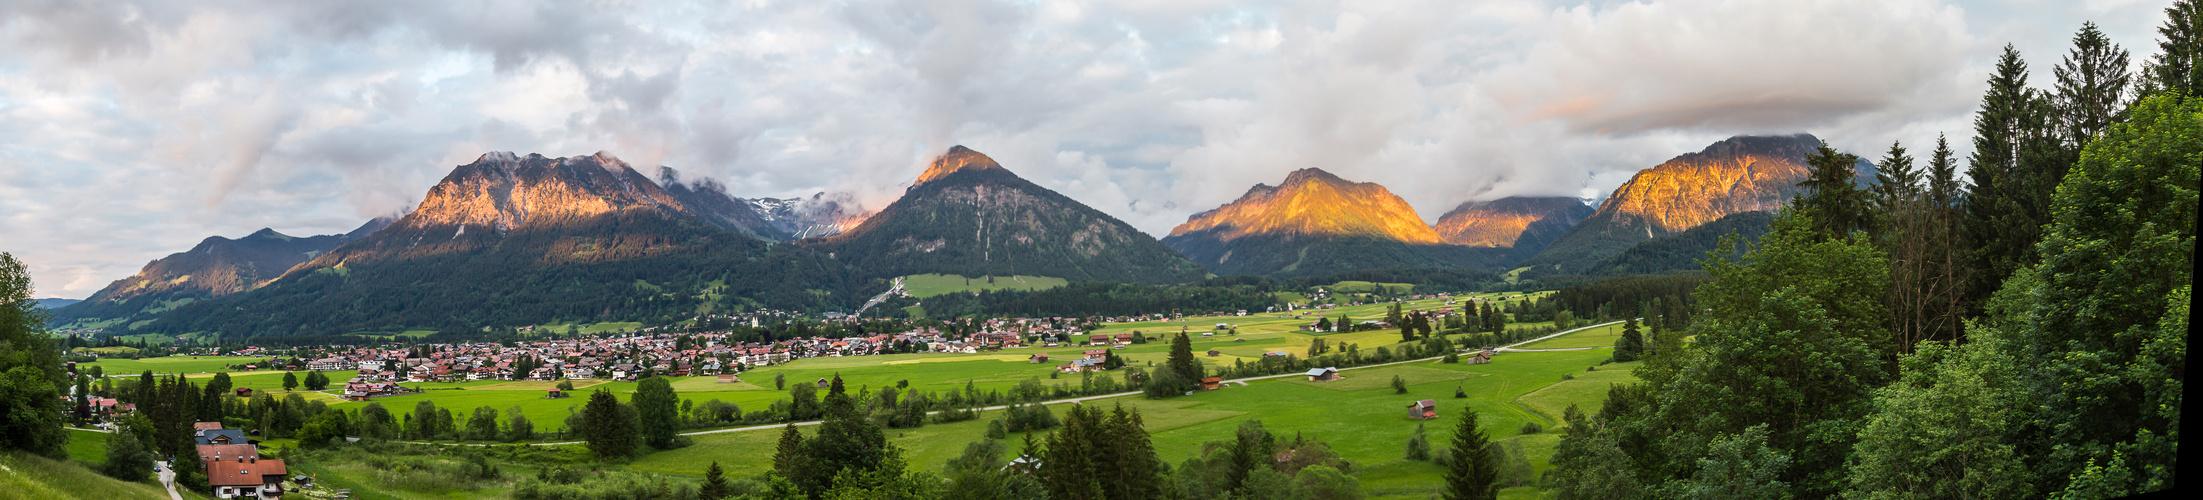 Oberstdorf Panorama #3